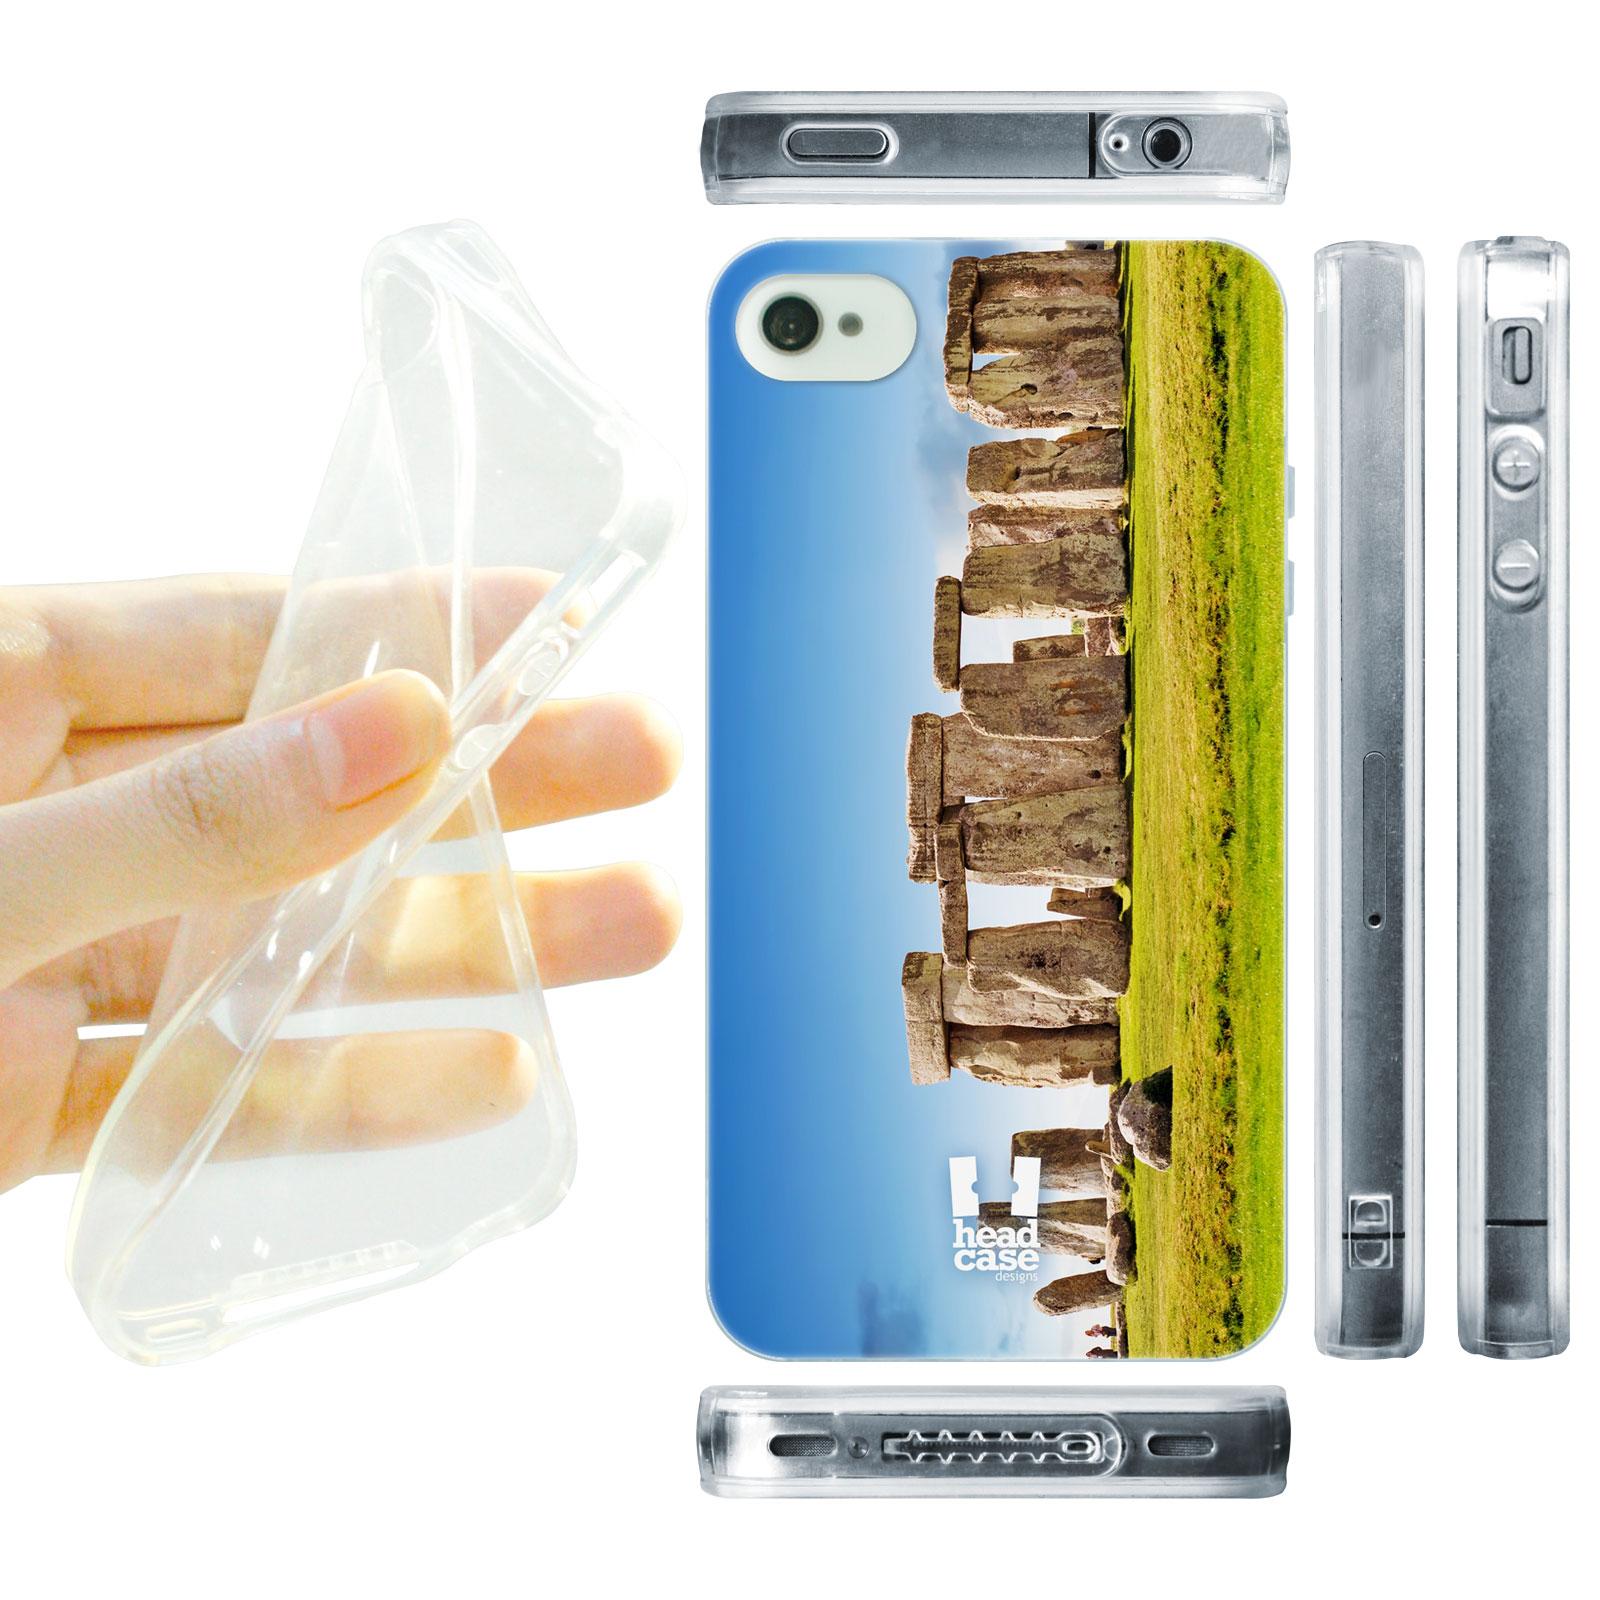 HEAD CASE silikonový obal na mobil Iphone 4/4S foto Stonehenge Anglie tráva